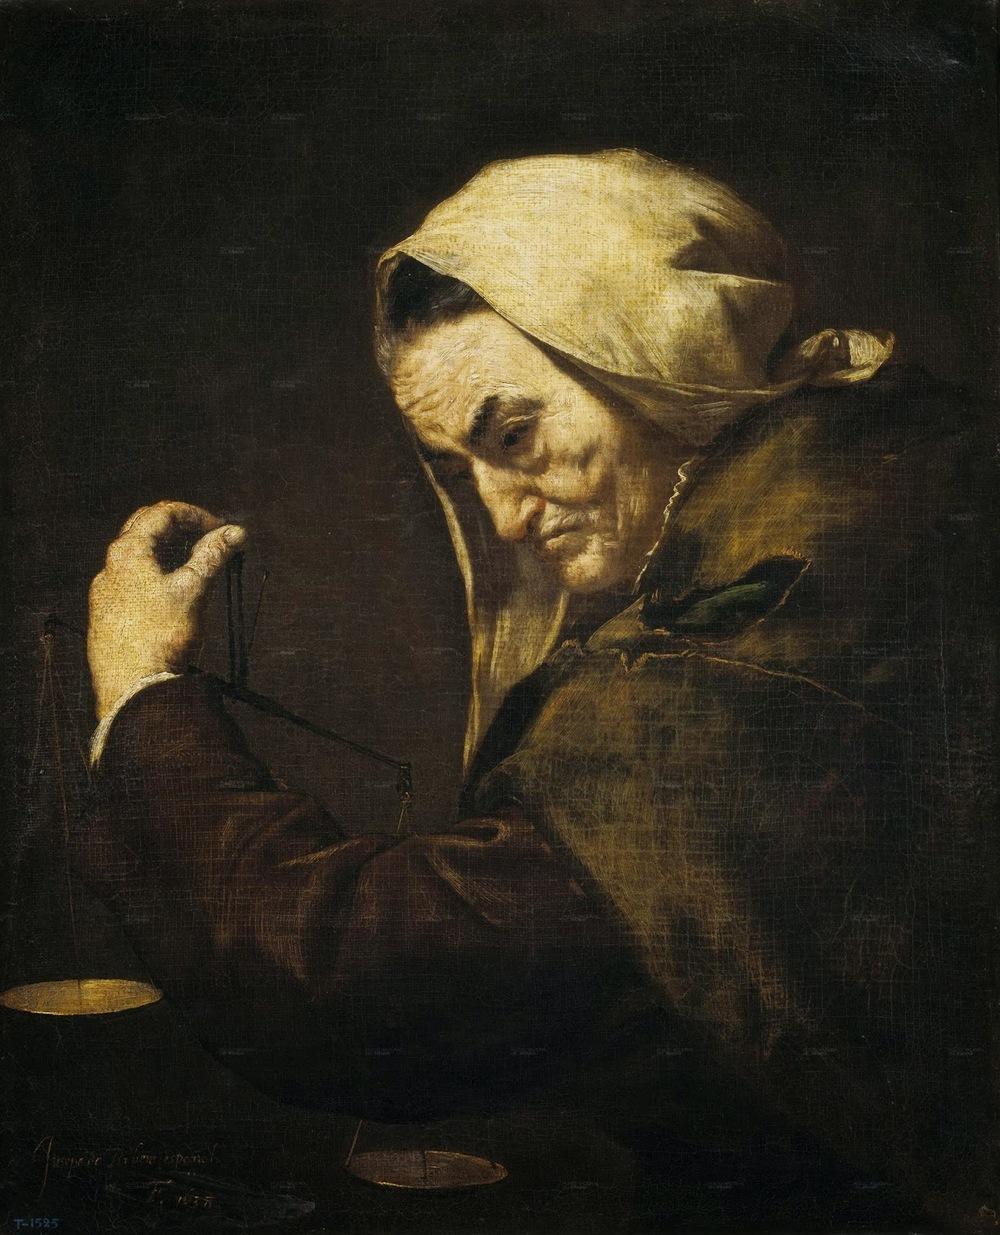 The old usurer, Jusepe de Ribera